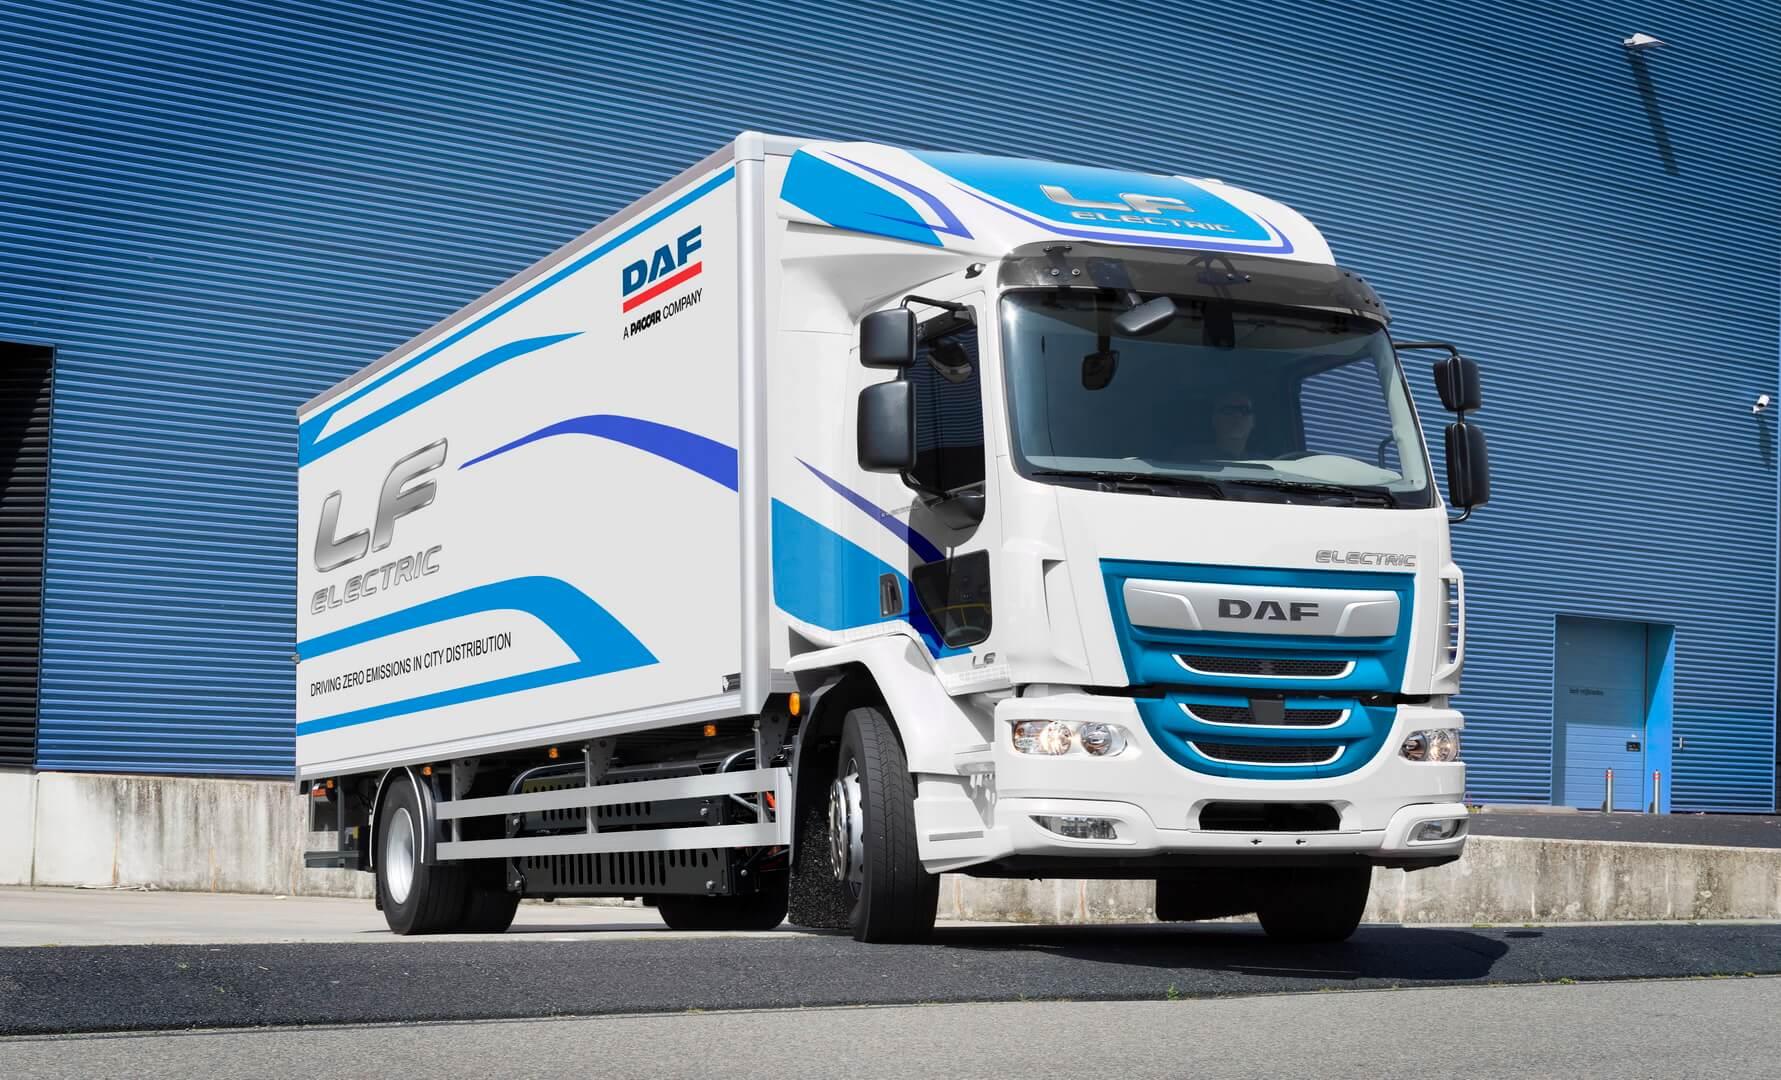 Электрический грузовик DAF LFElectric